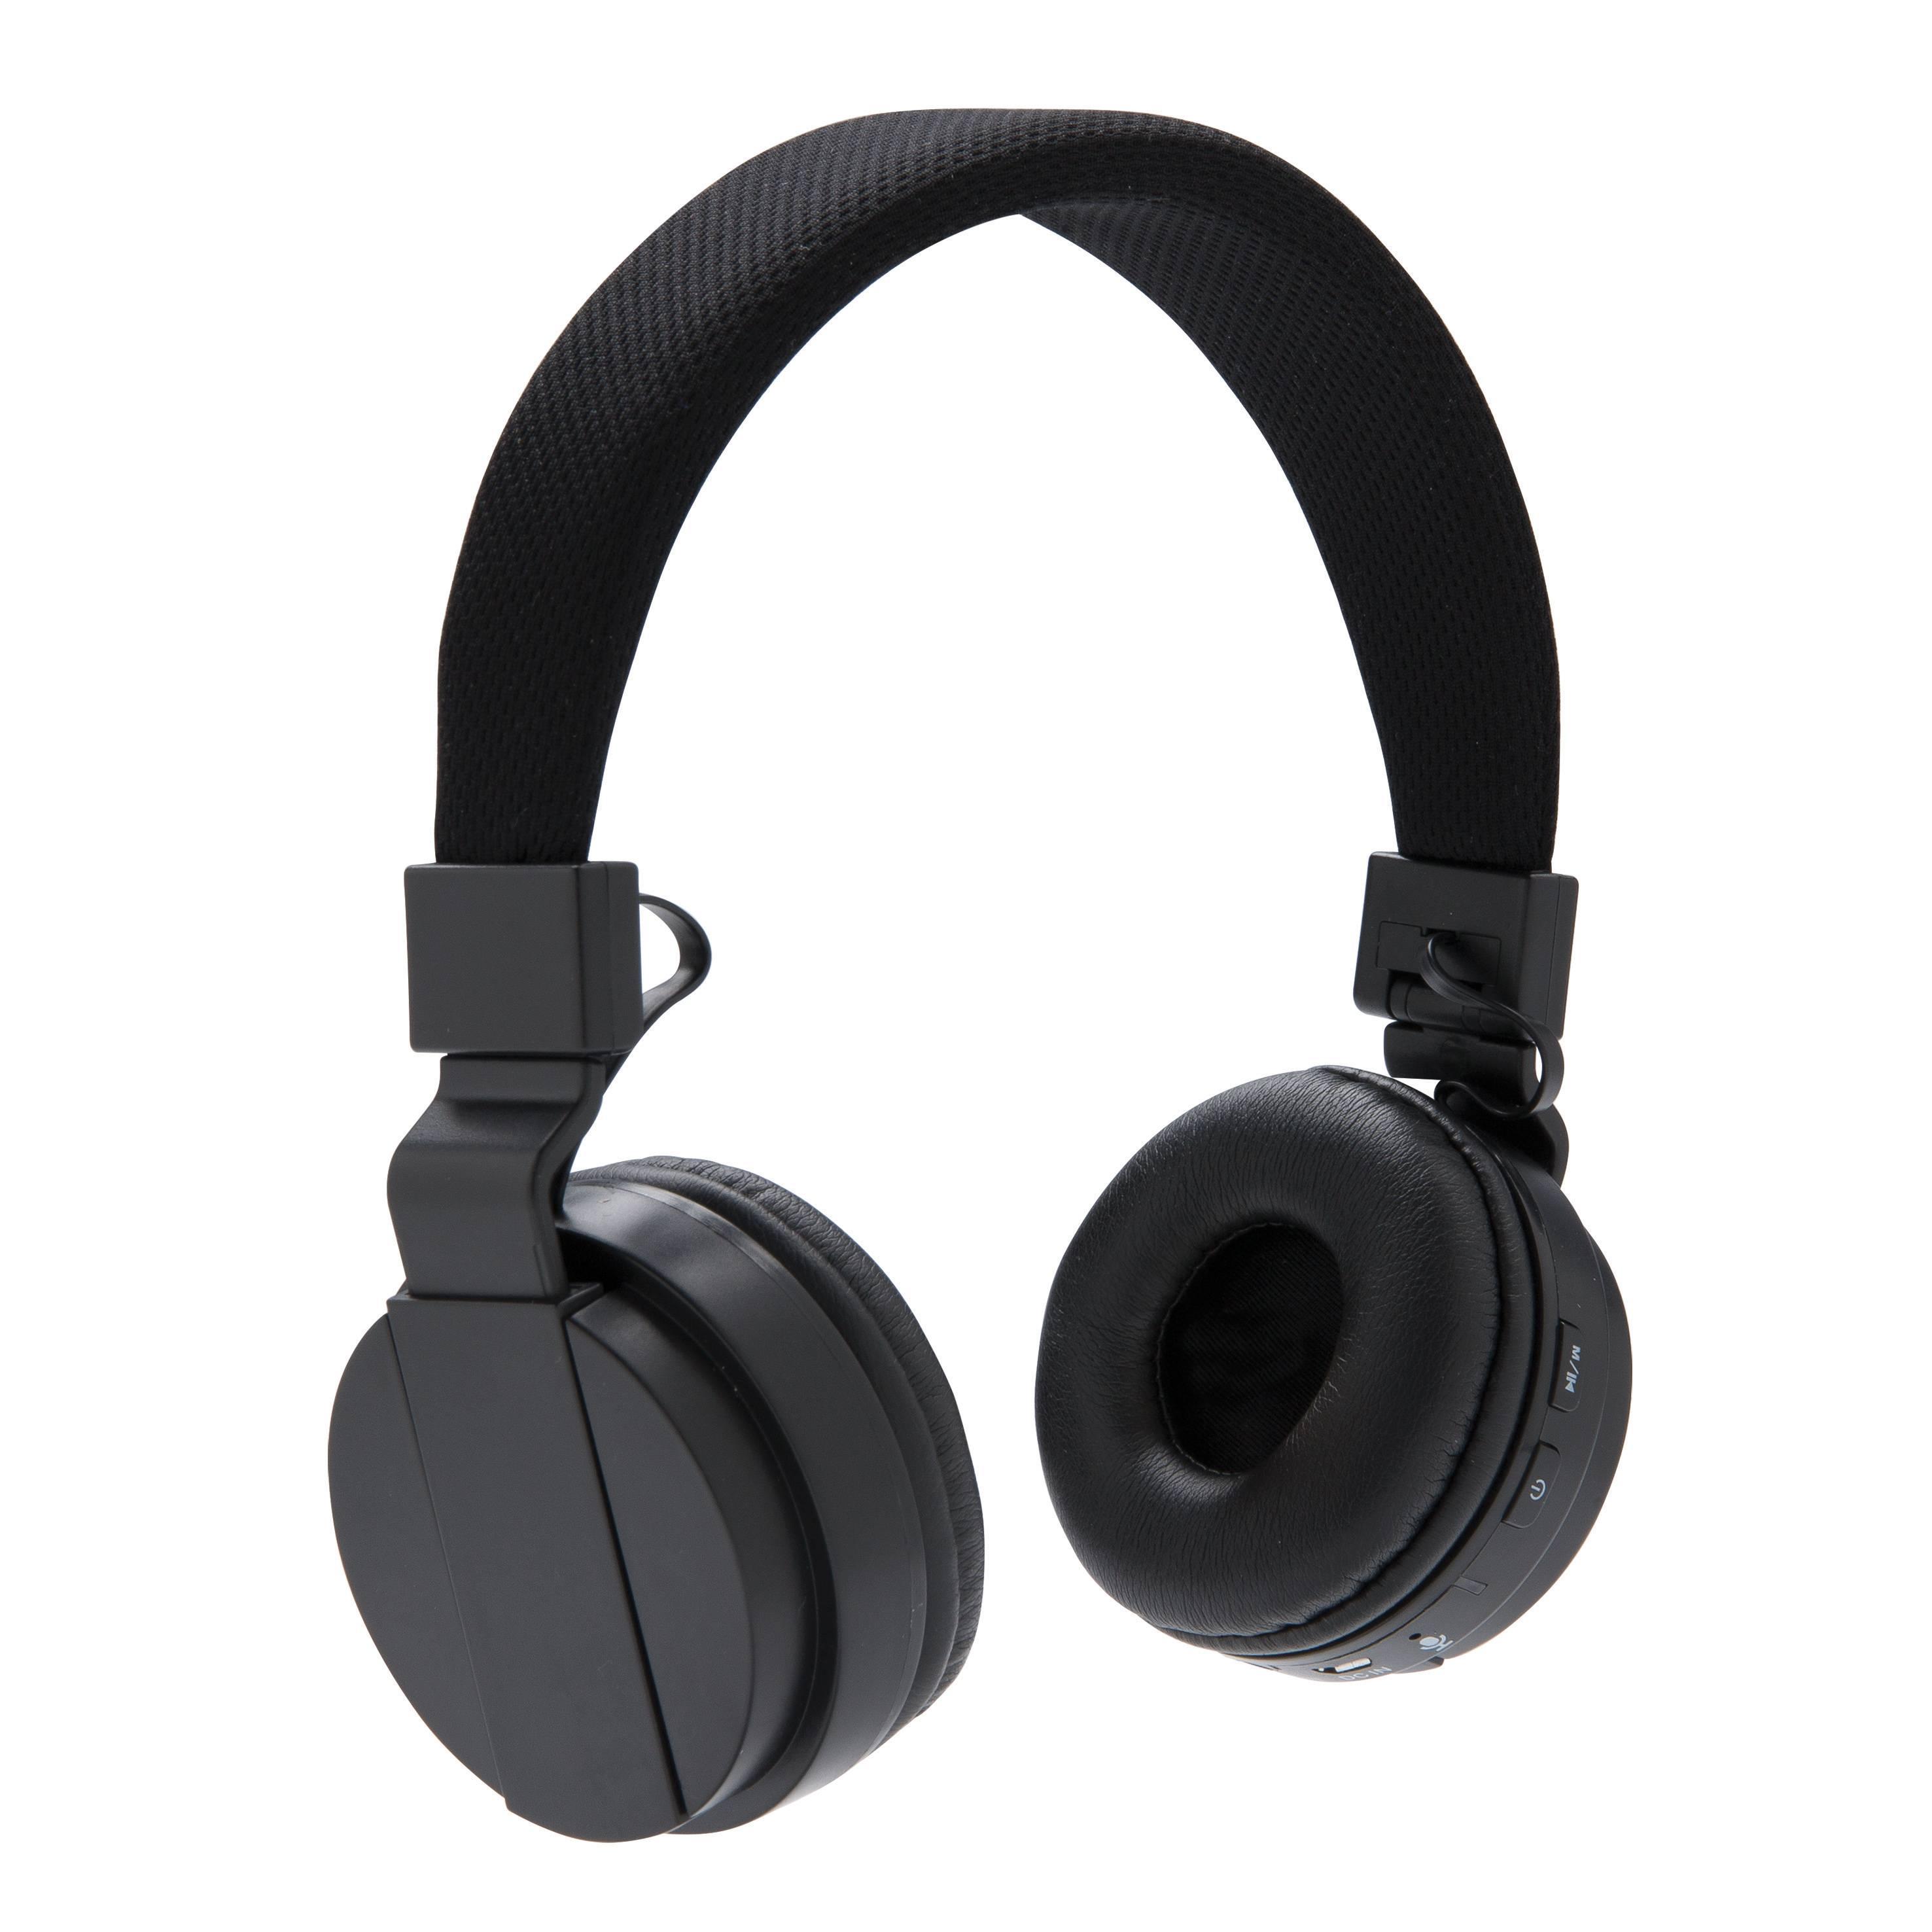 Headset - Foldable bluetooth headphone (Sort) thumbnail